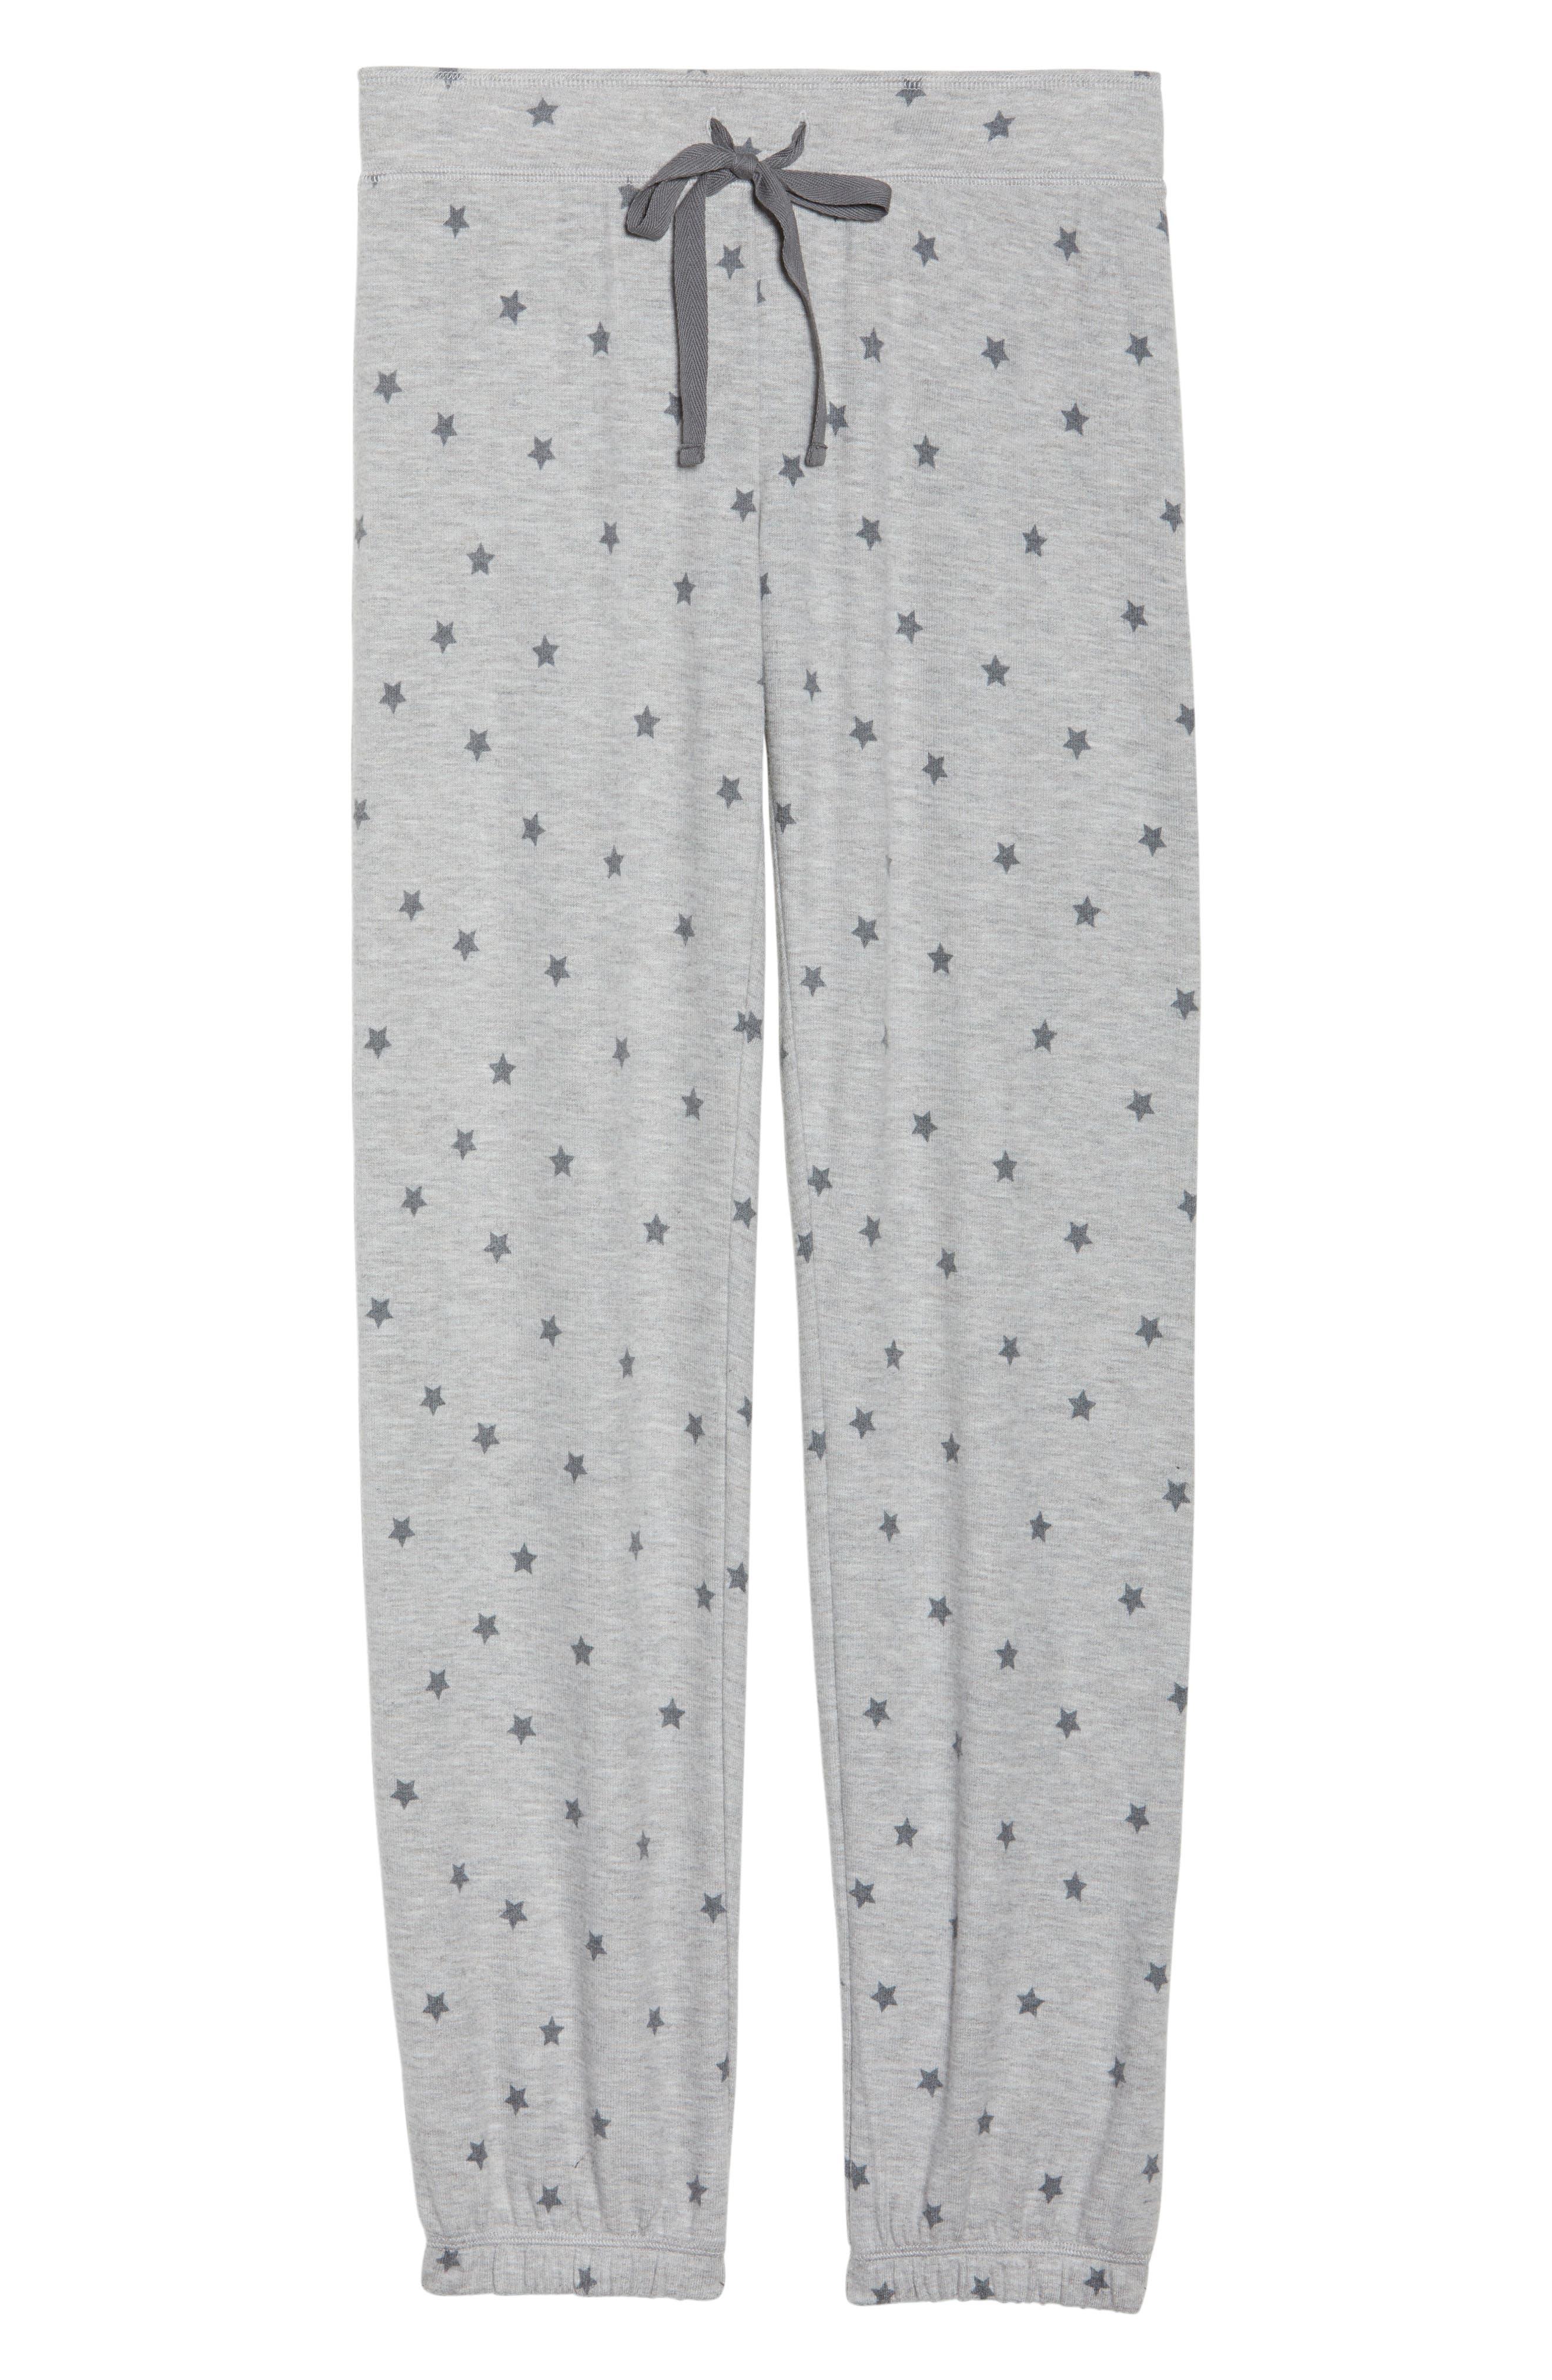 Peachy Pajama Pants,                             Alternate thumbnail 6, color,                             020